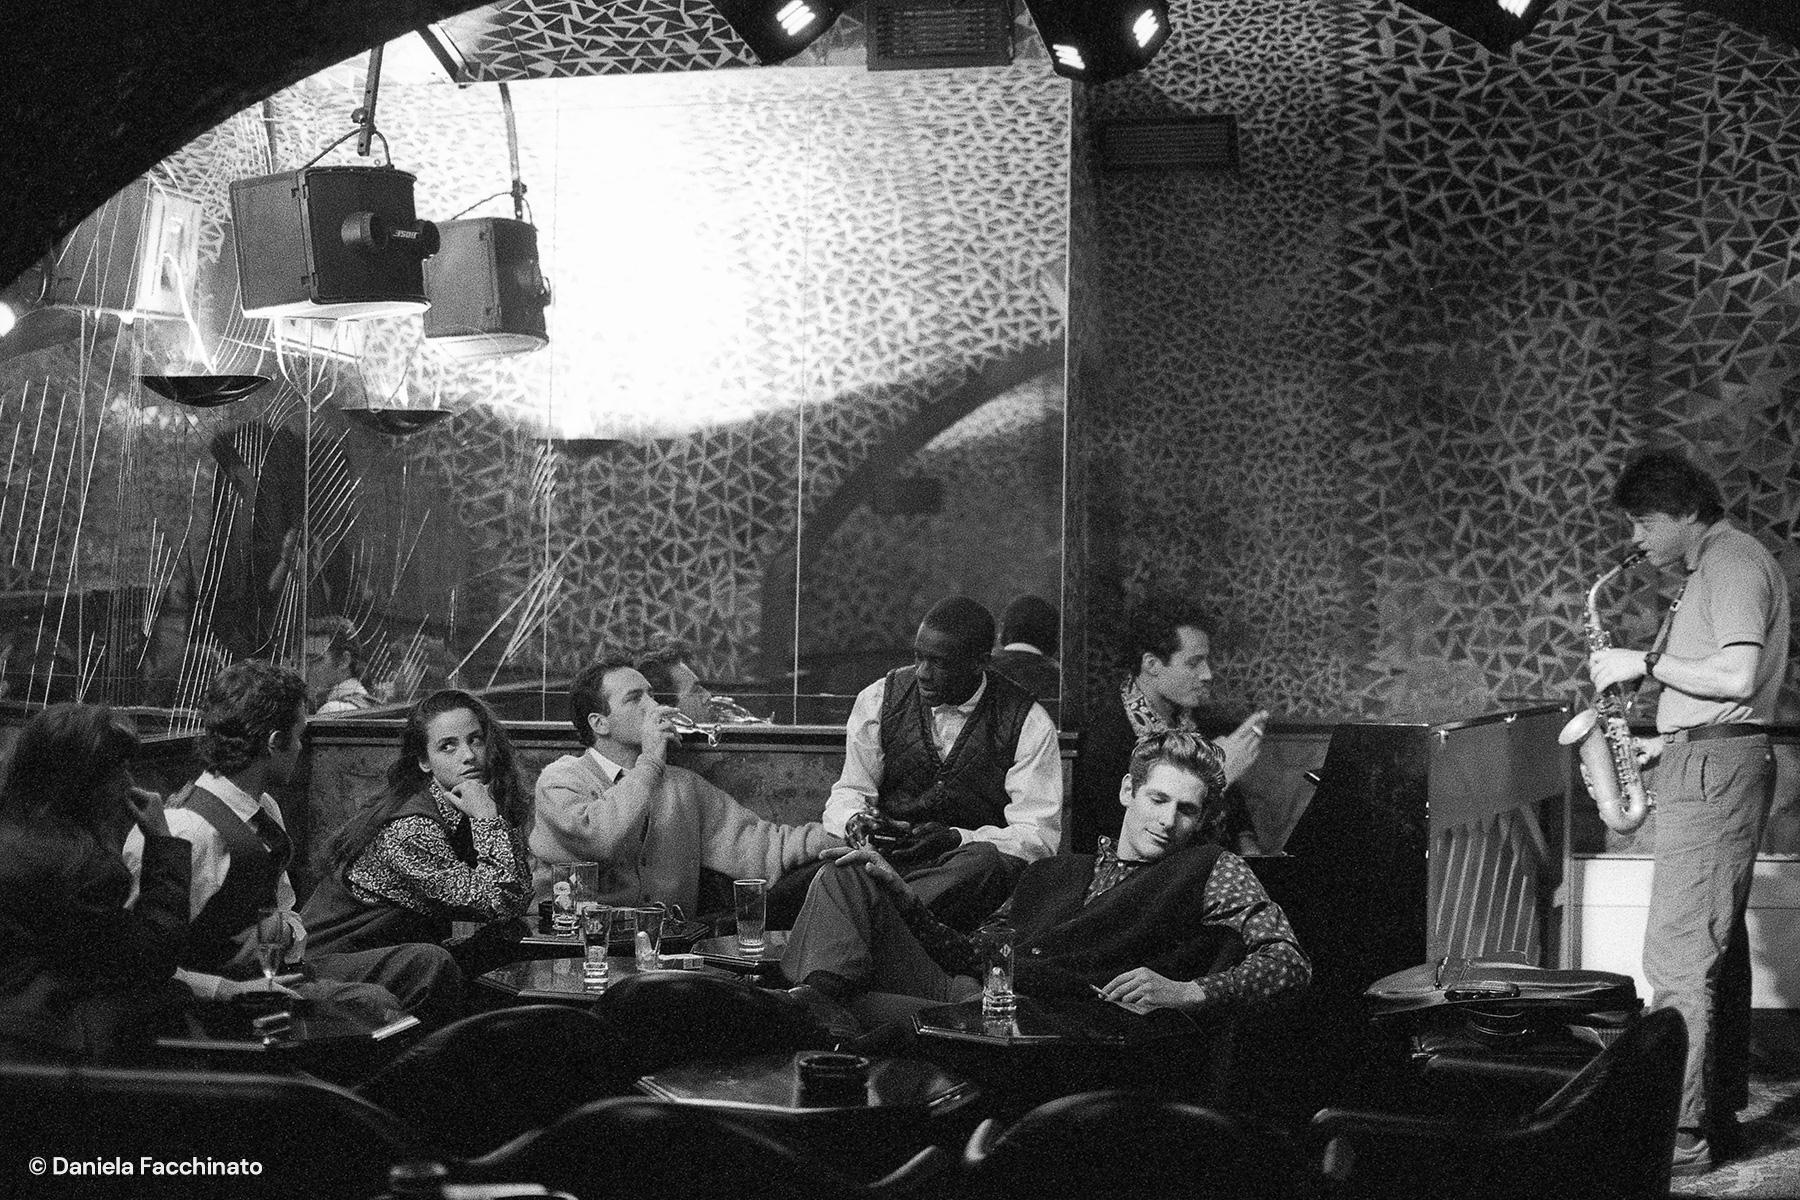 Paris 1989. Montana Jazz Club. Advertising campaign for Massimo Osti